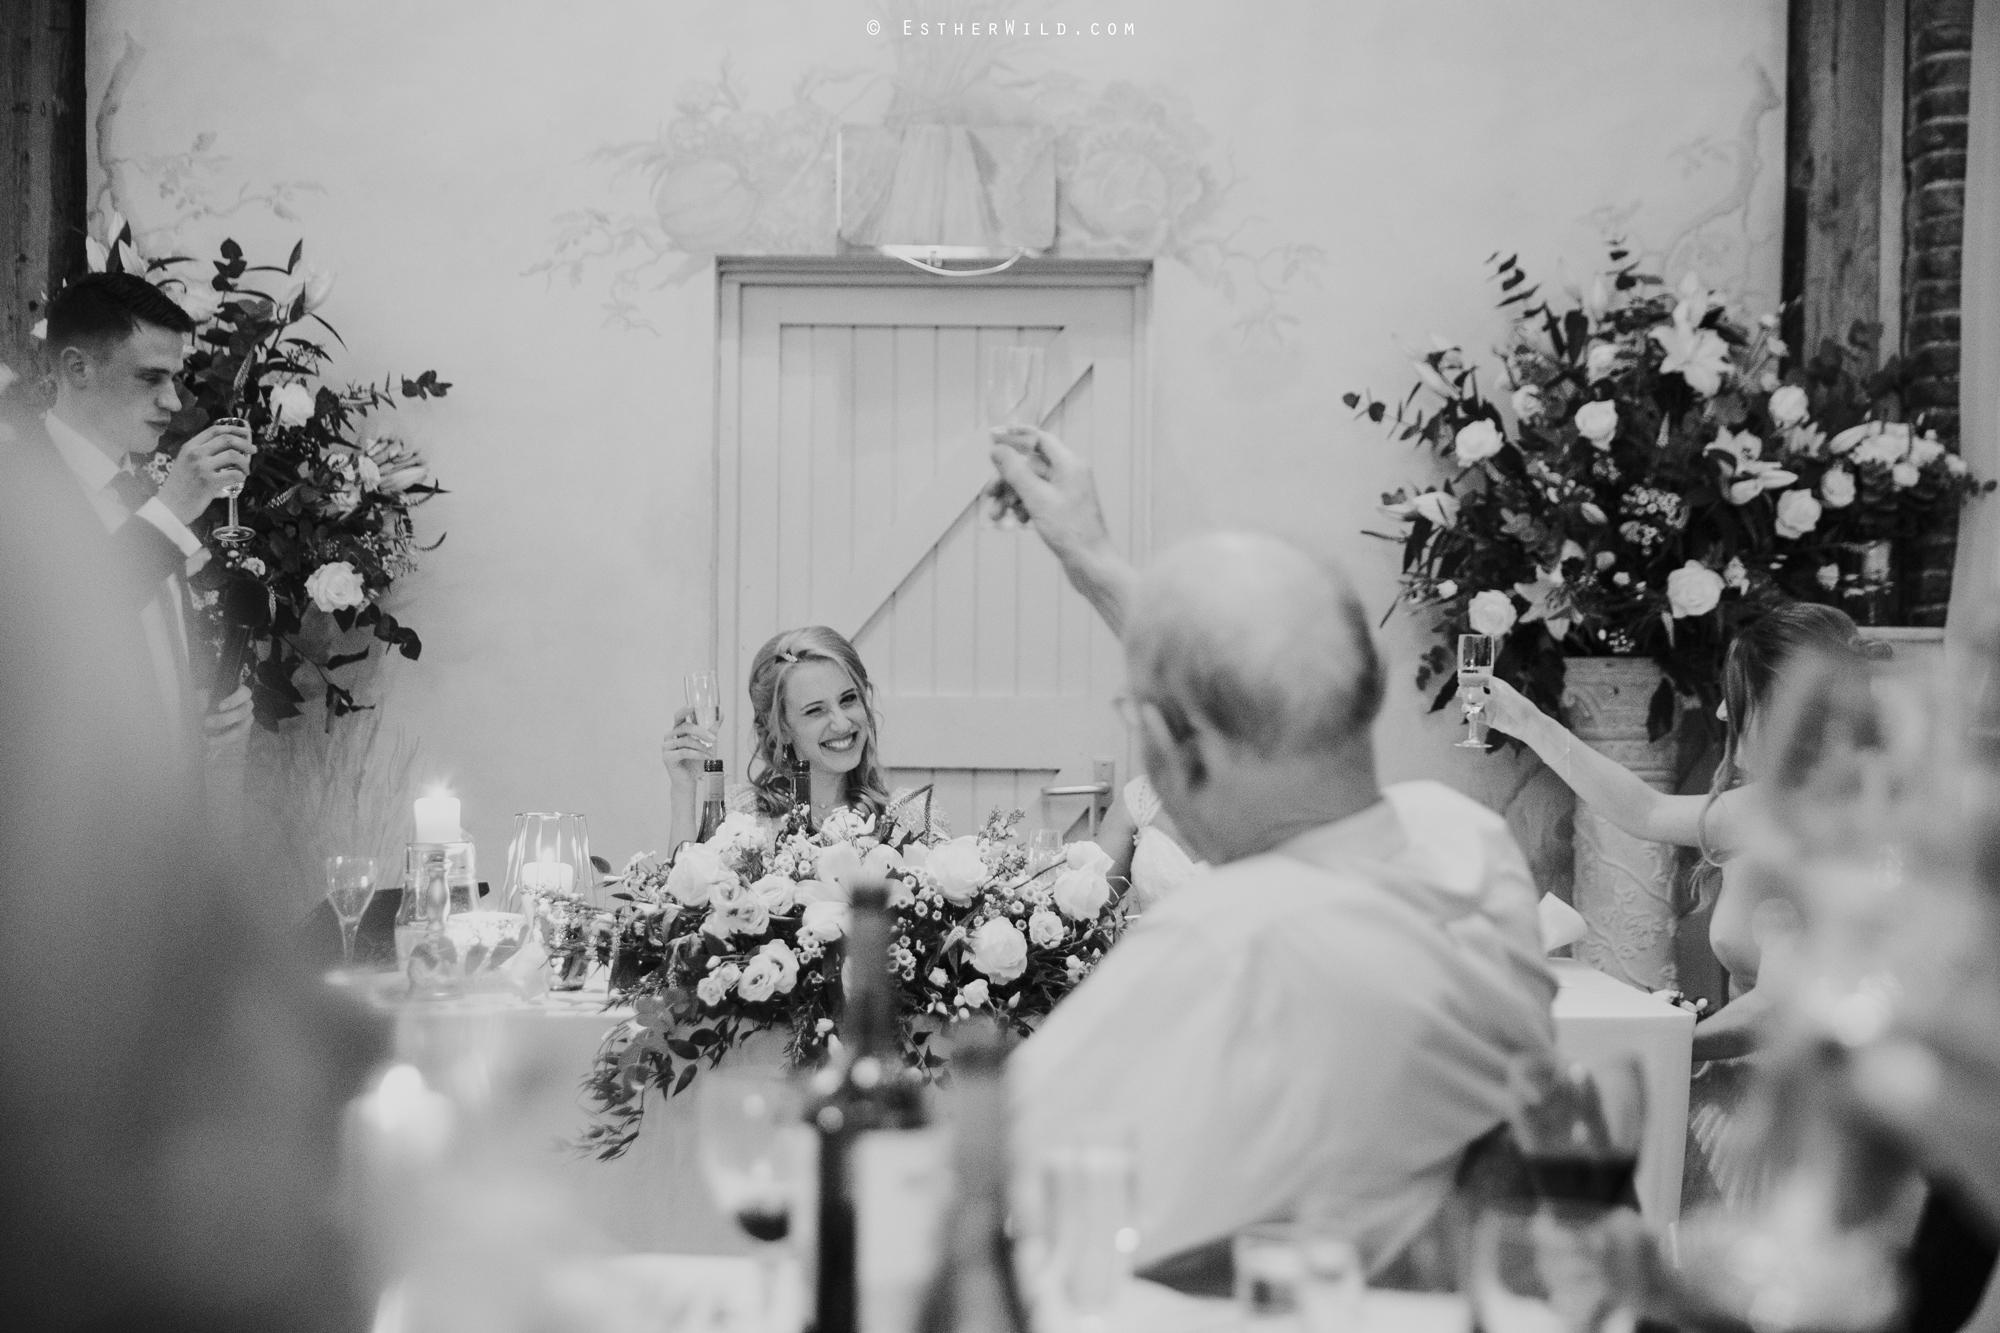 Elms_Barn_Weddings_Suffolk_Photographer_Copyright_Esther_Wild_IMG_2920-2.jpg